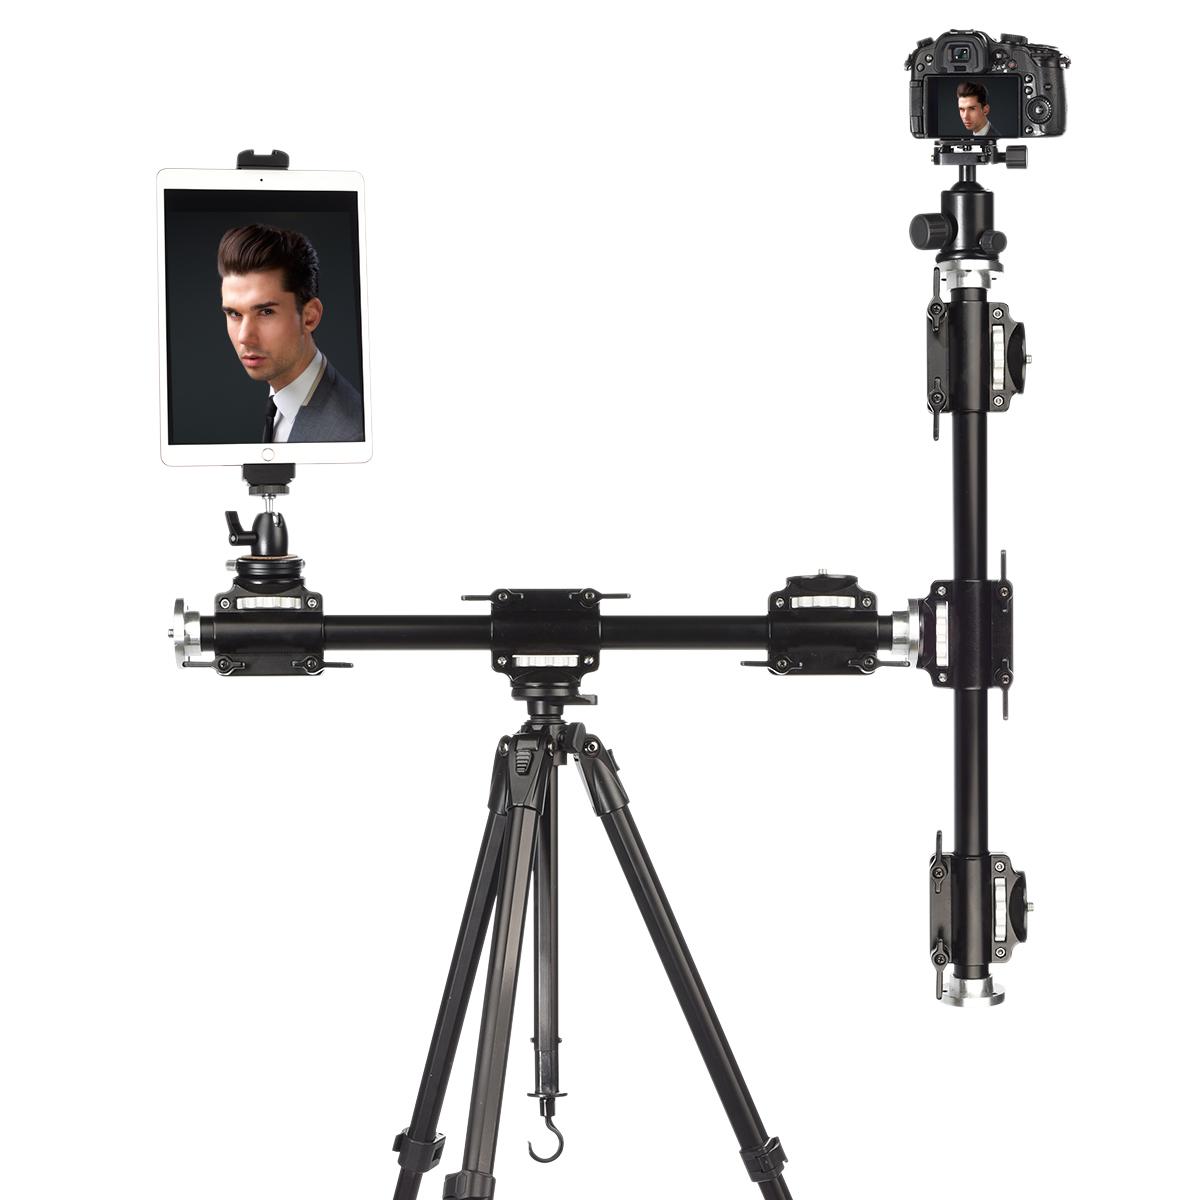 700417_ArmBar_tablet-pole-camera-1.jpg